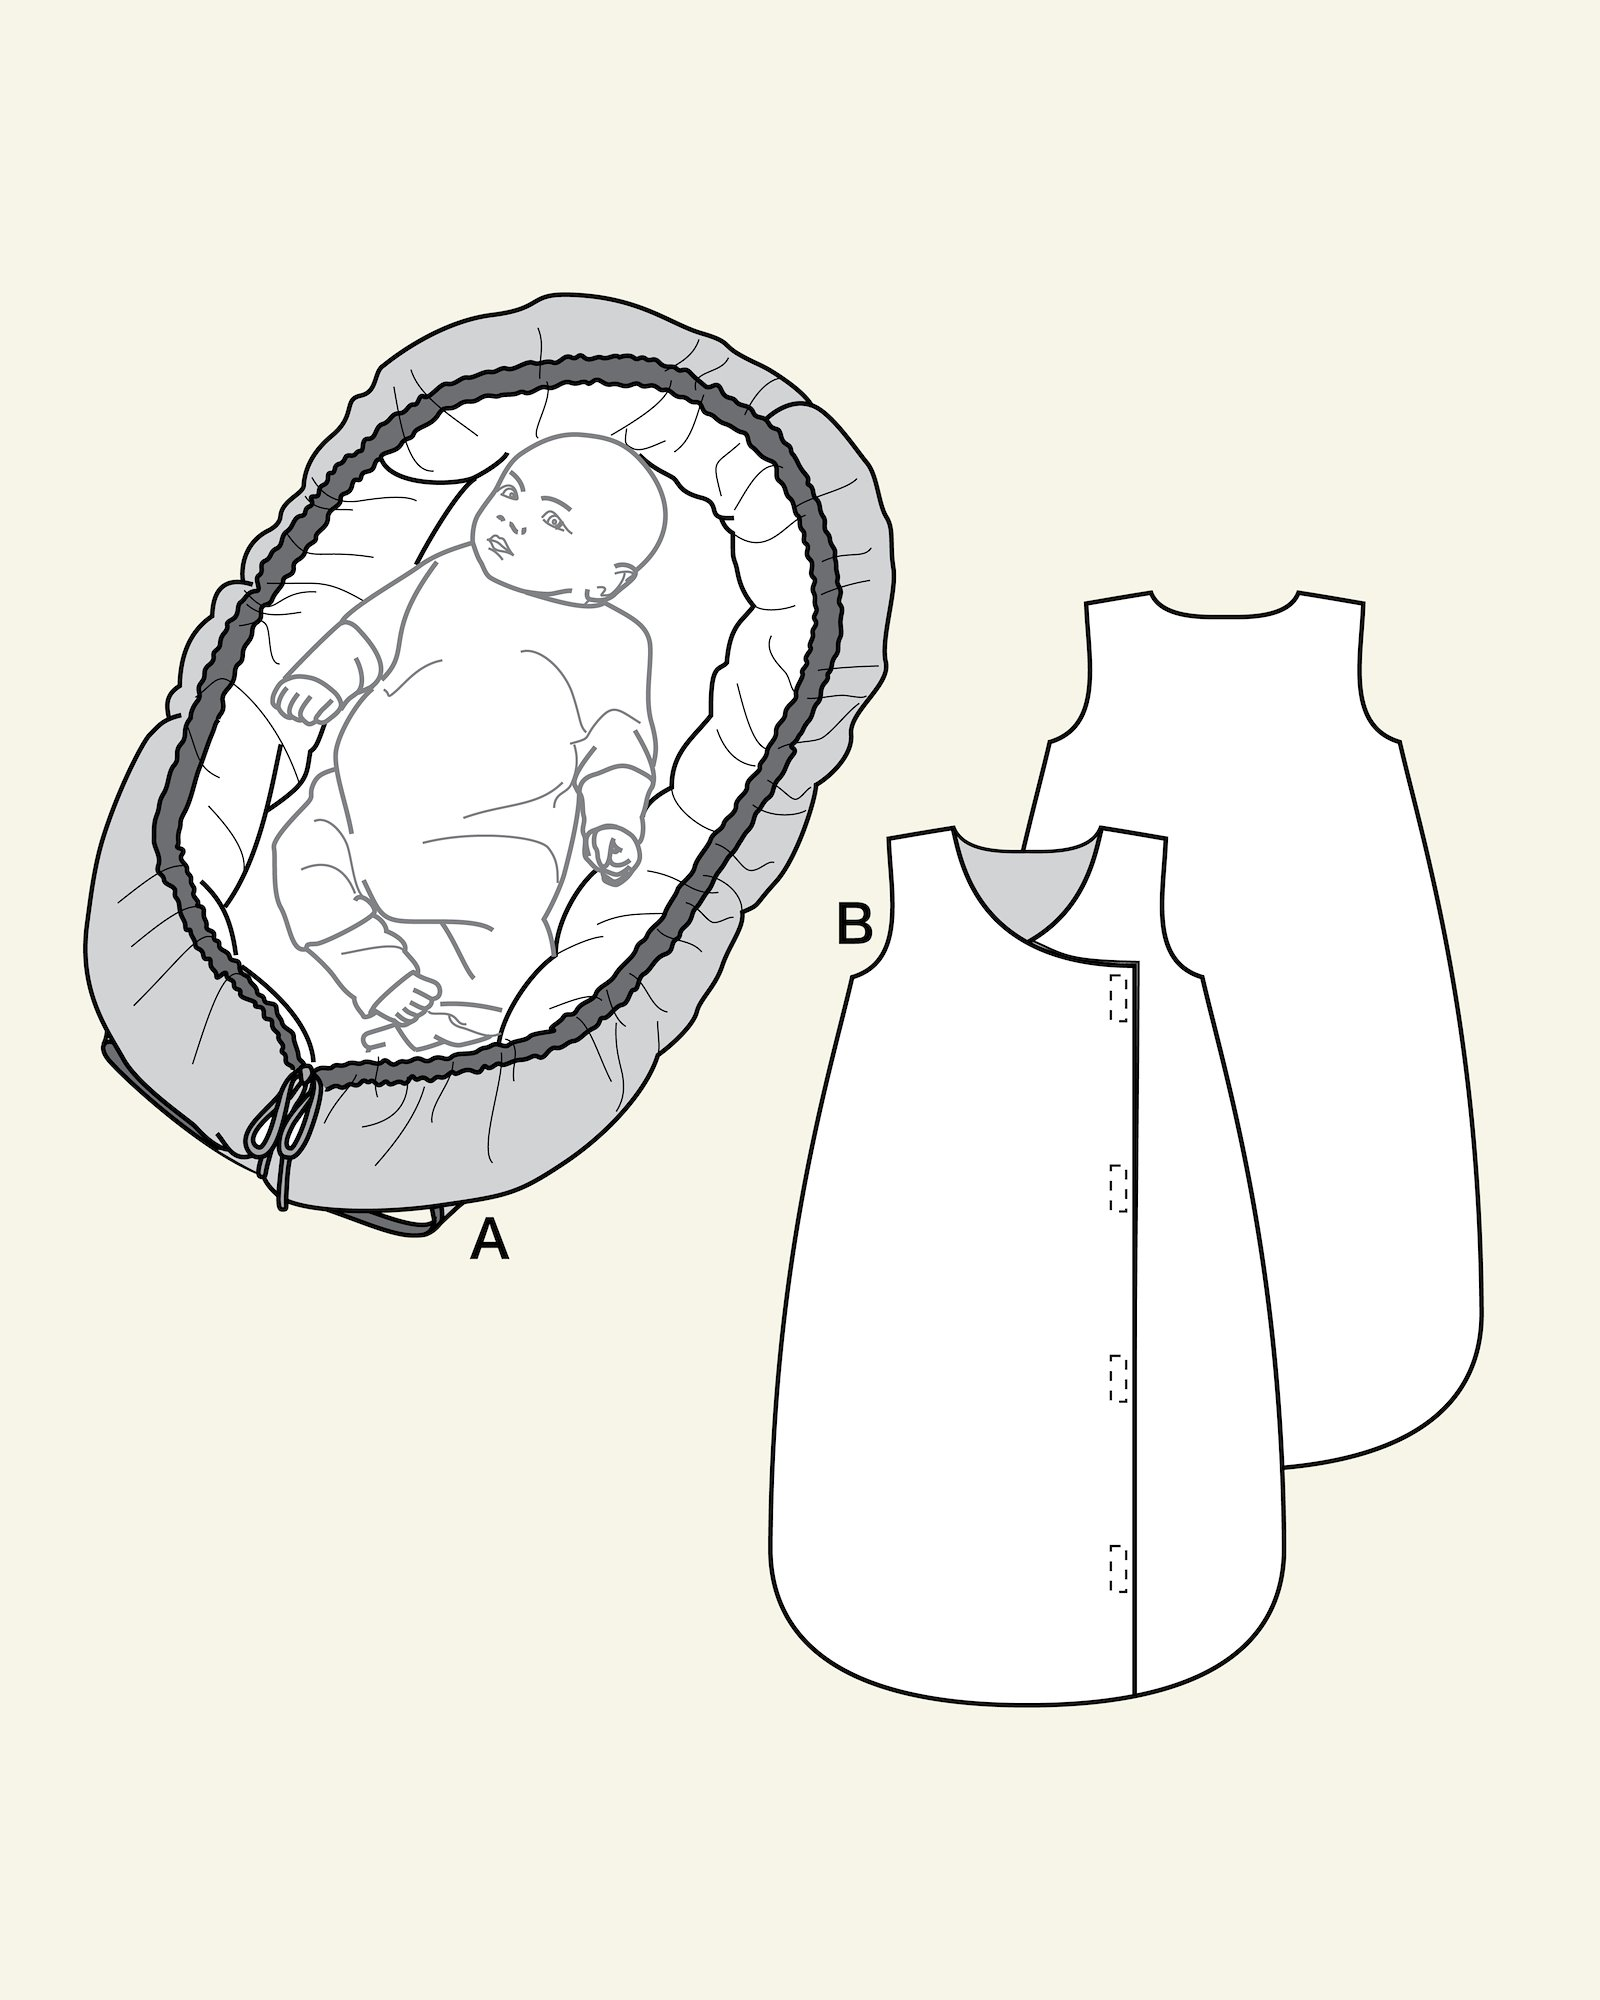 Baby nest and sleeping bag